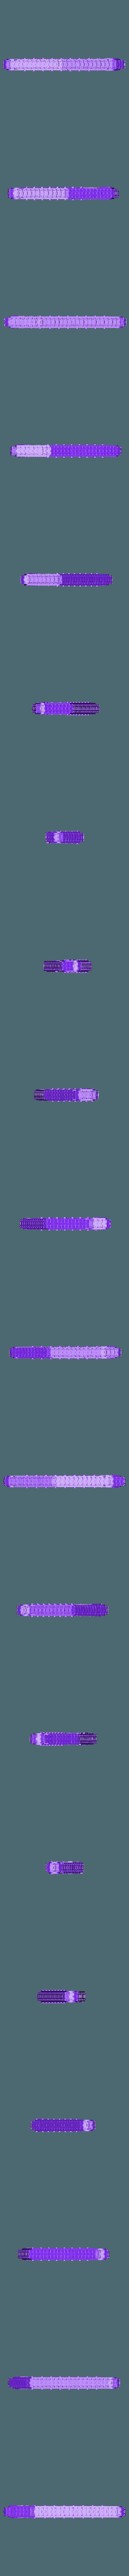 Right_Side_V2.stl Download free STL file Sigilates Shooty Shooty Dakka Defense Boat • Design to 3D print, danny_cyanide